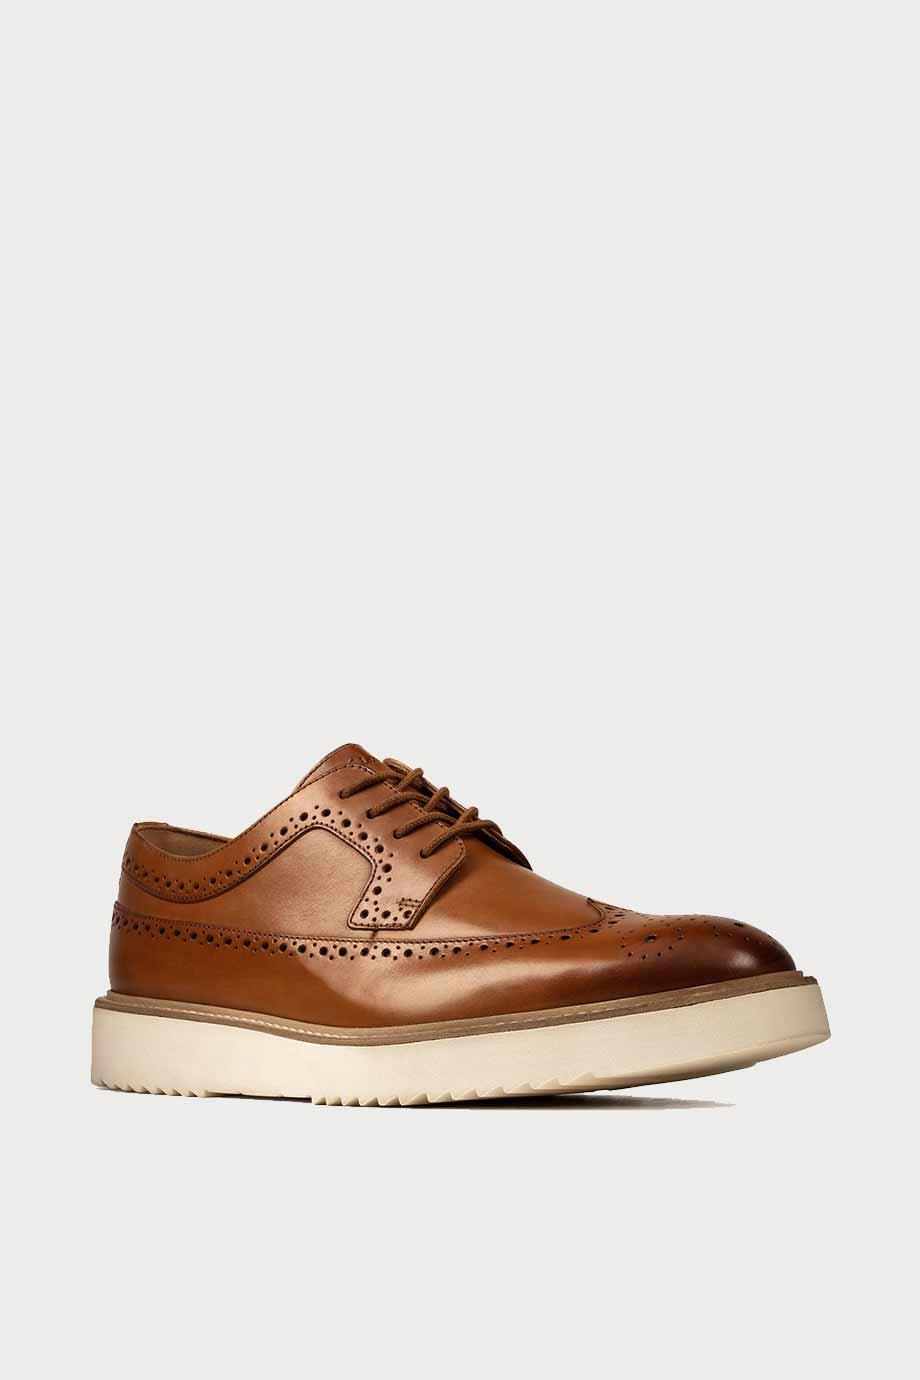 spiridoula metheniti shoes xalkida p Ernest Limit clarks tan leather 2